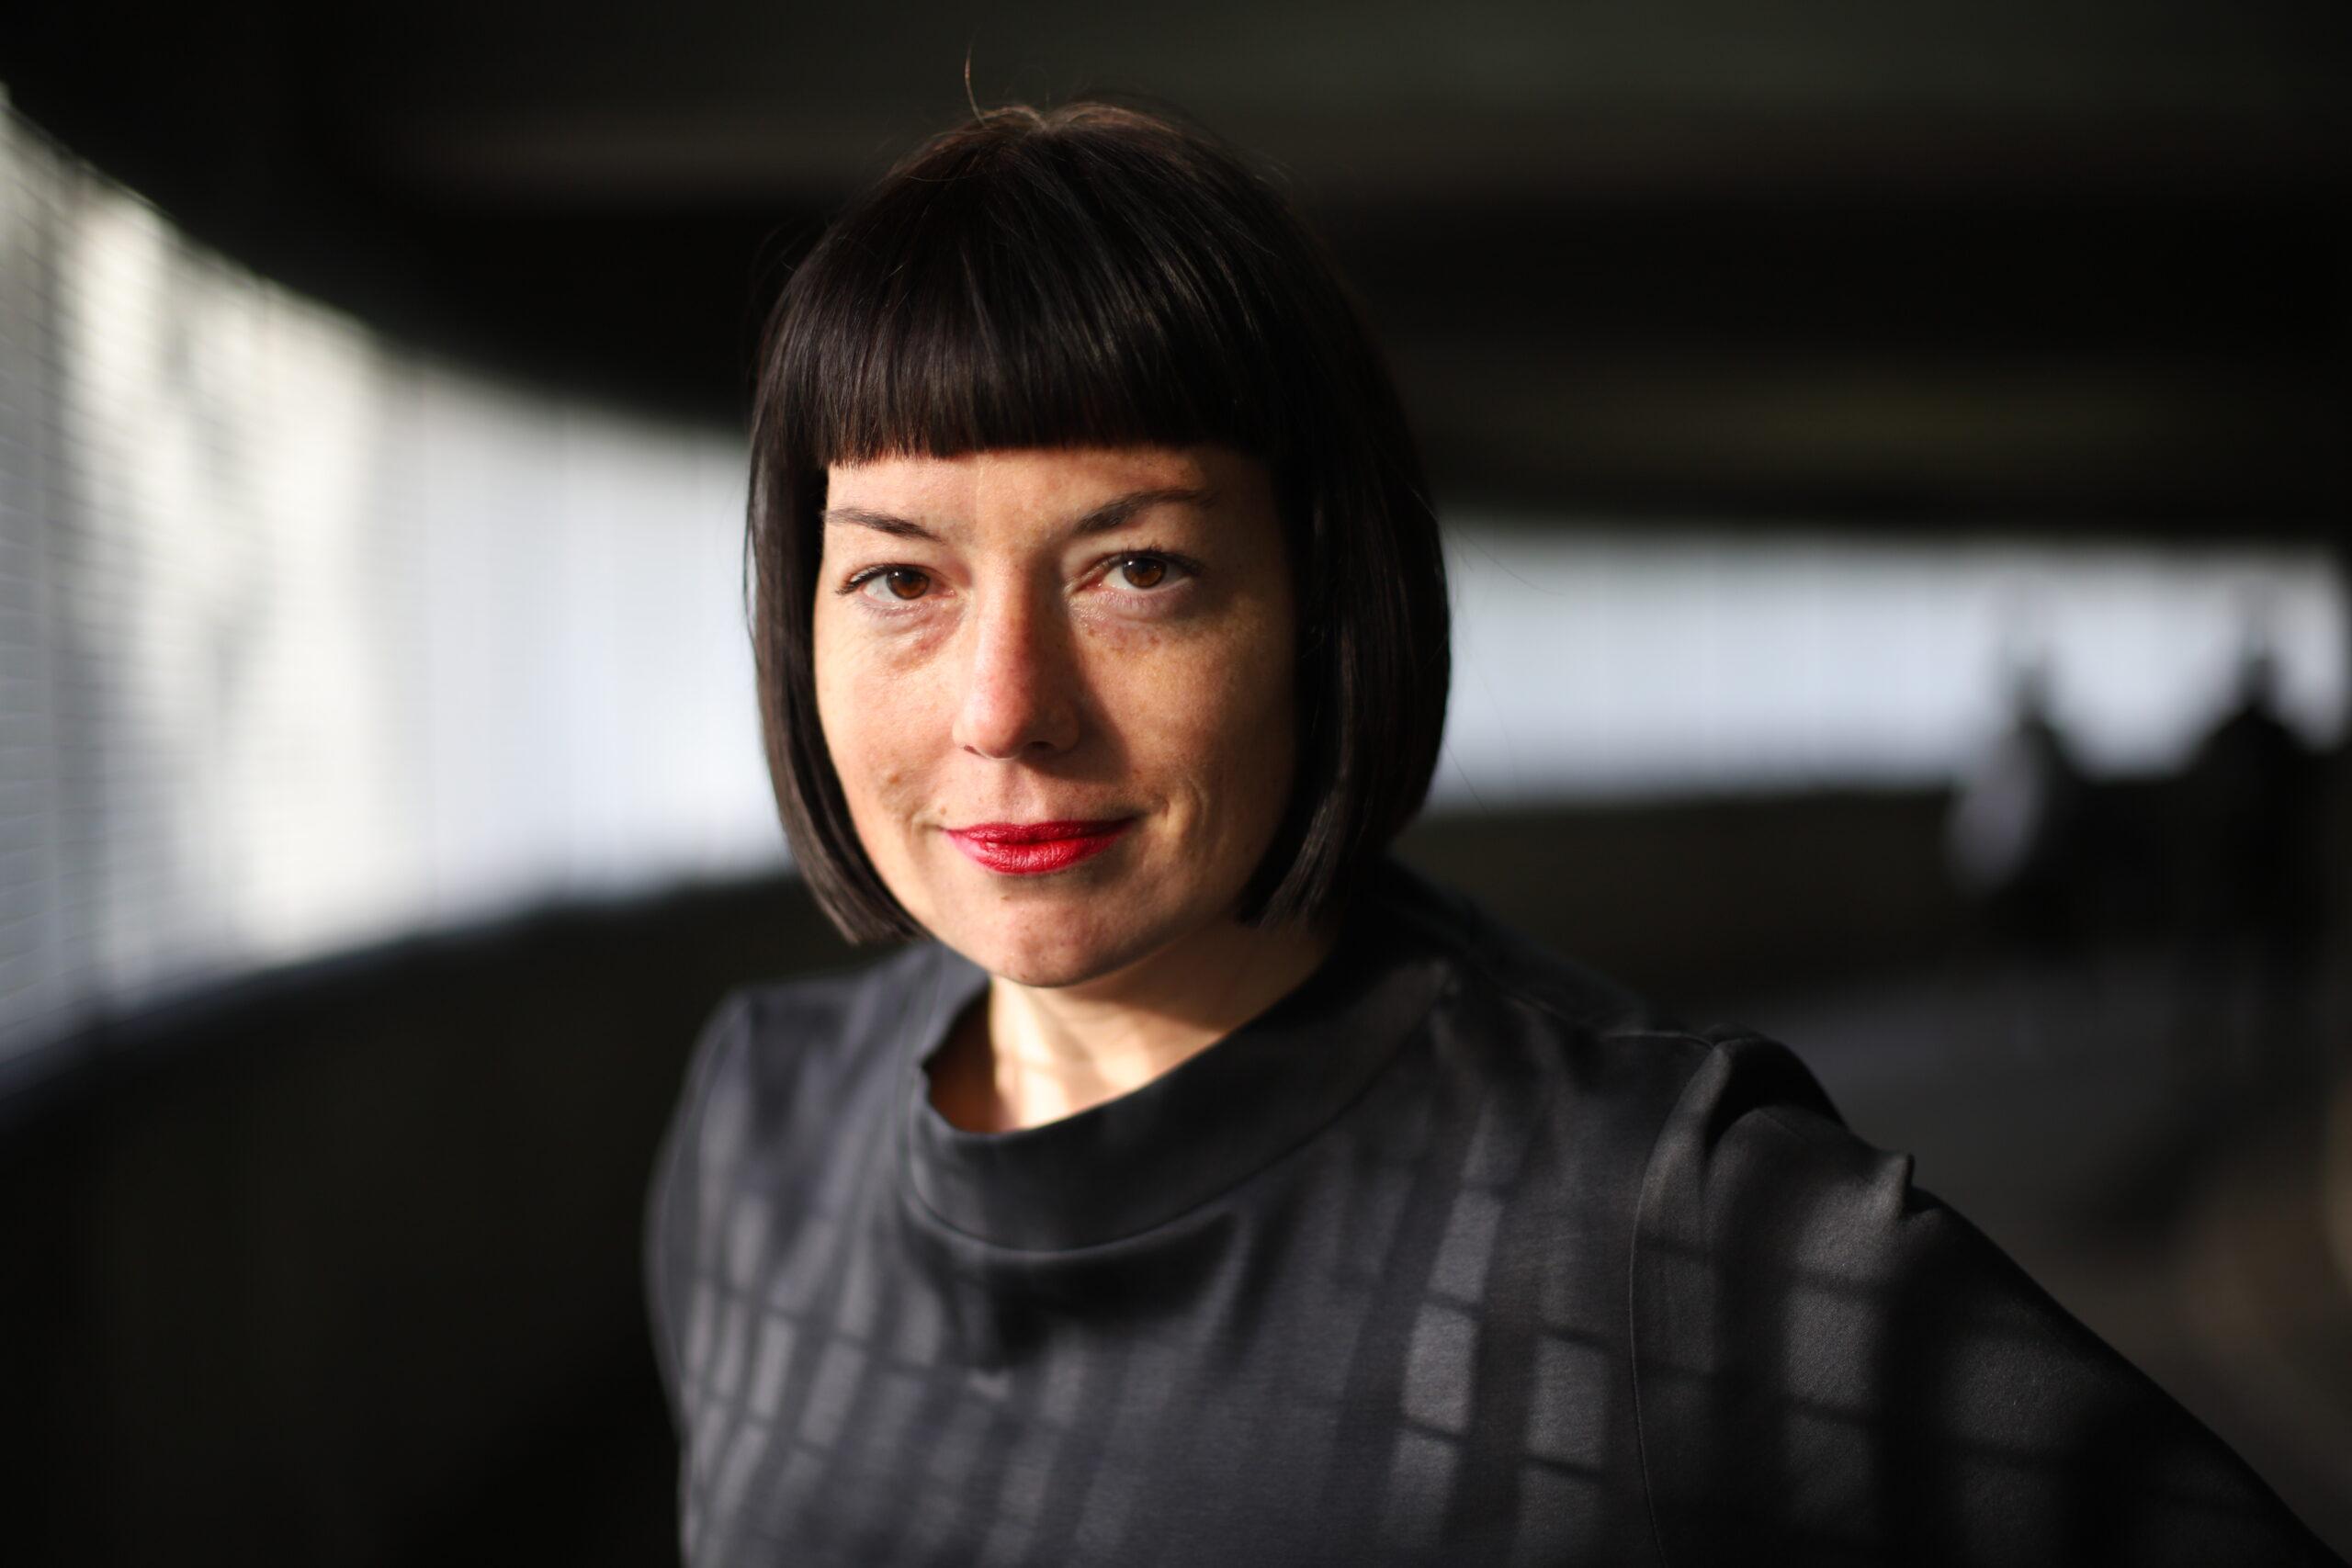 Karin Schoefegger